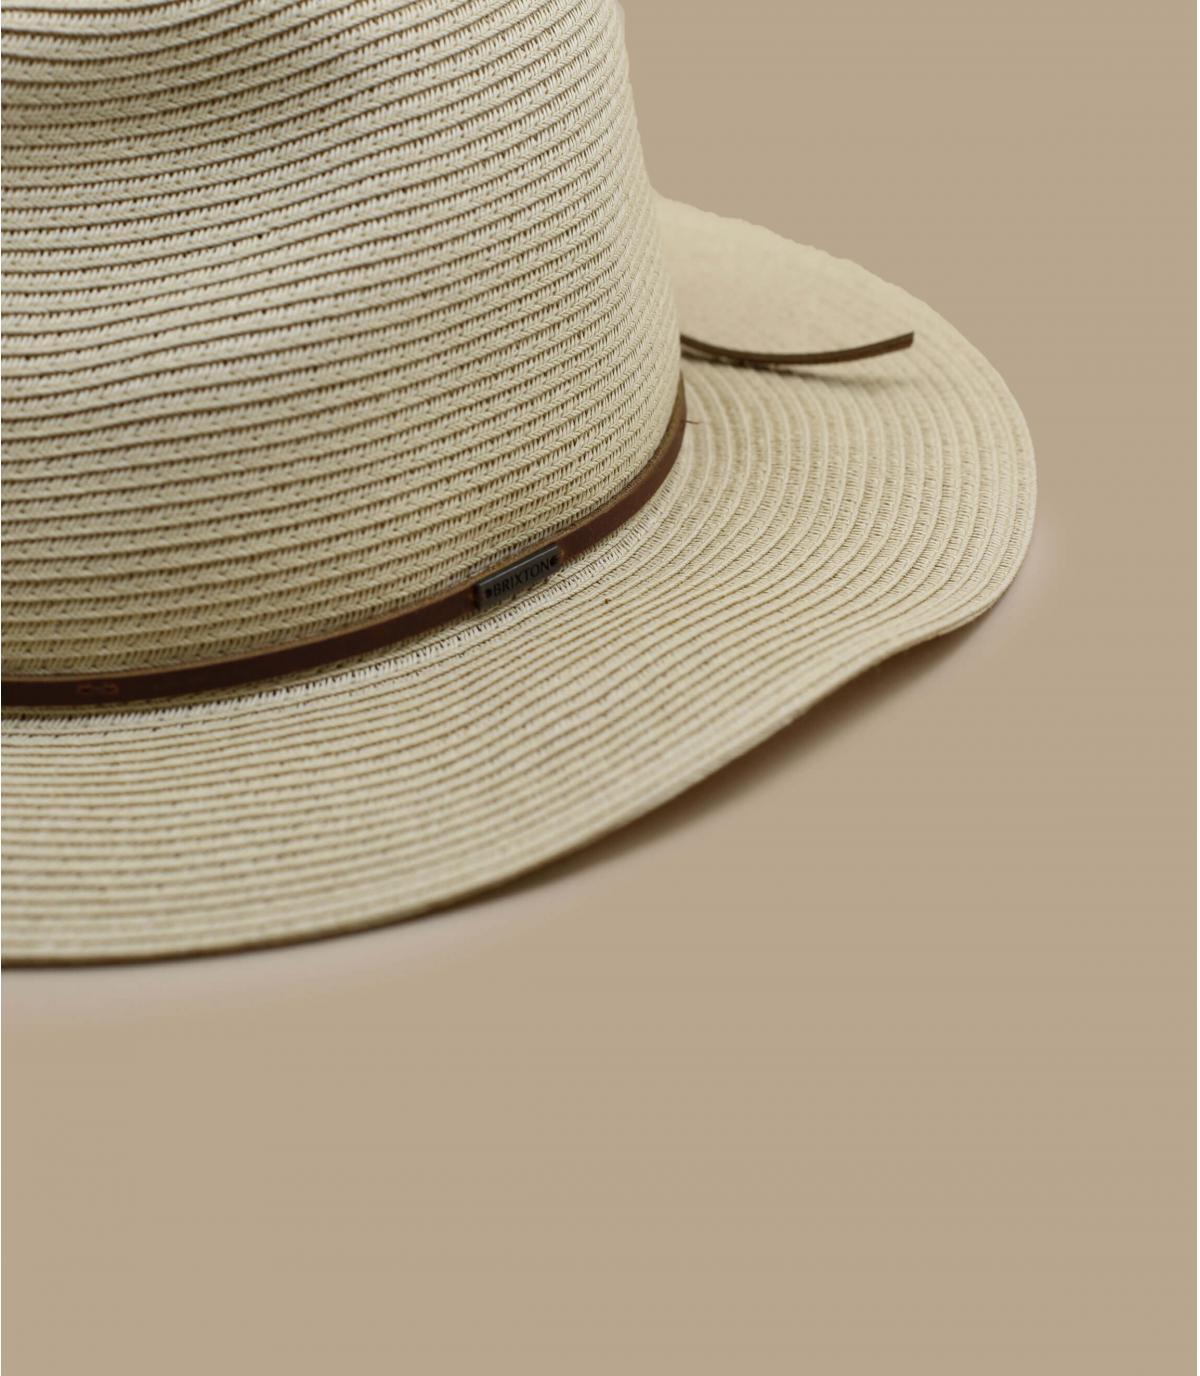 Details Wesley Straw Packable tan - Abbildung 3